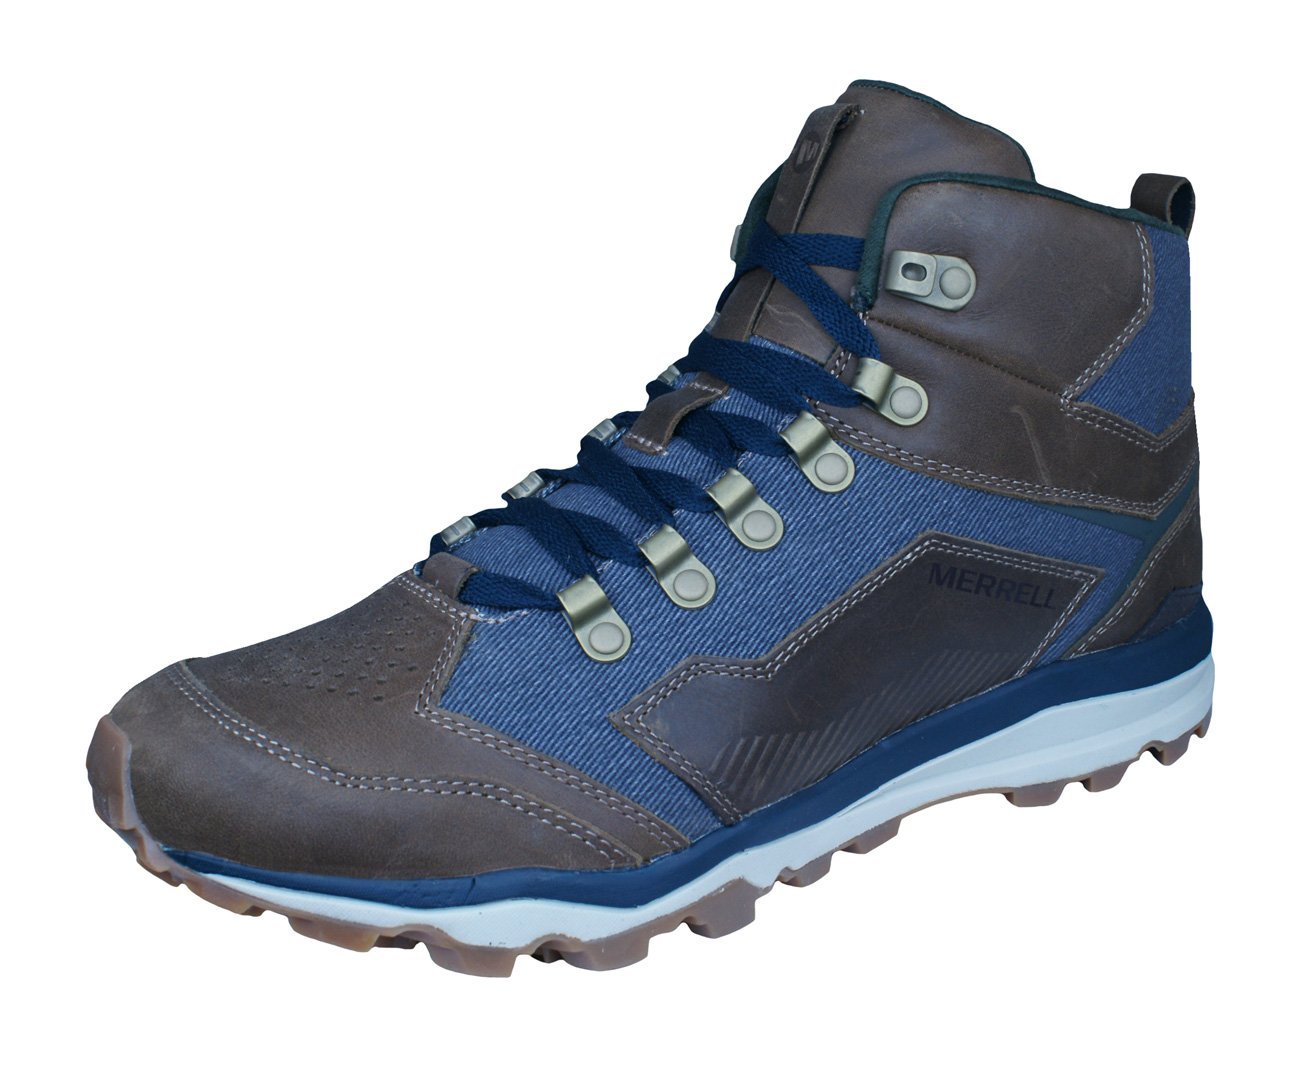 Merrell All Out Crusher Mid Shoes Men Rosin 2016 Schuhe  50 EU|Brown